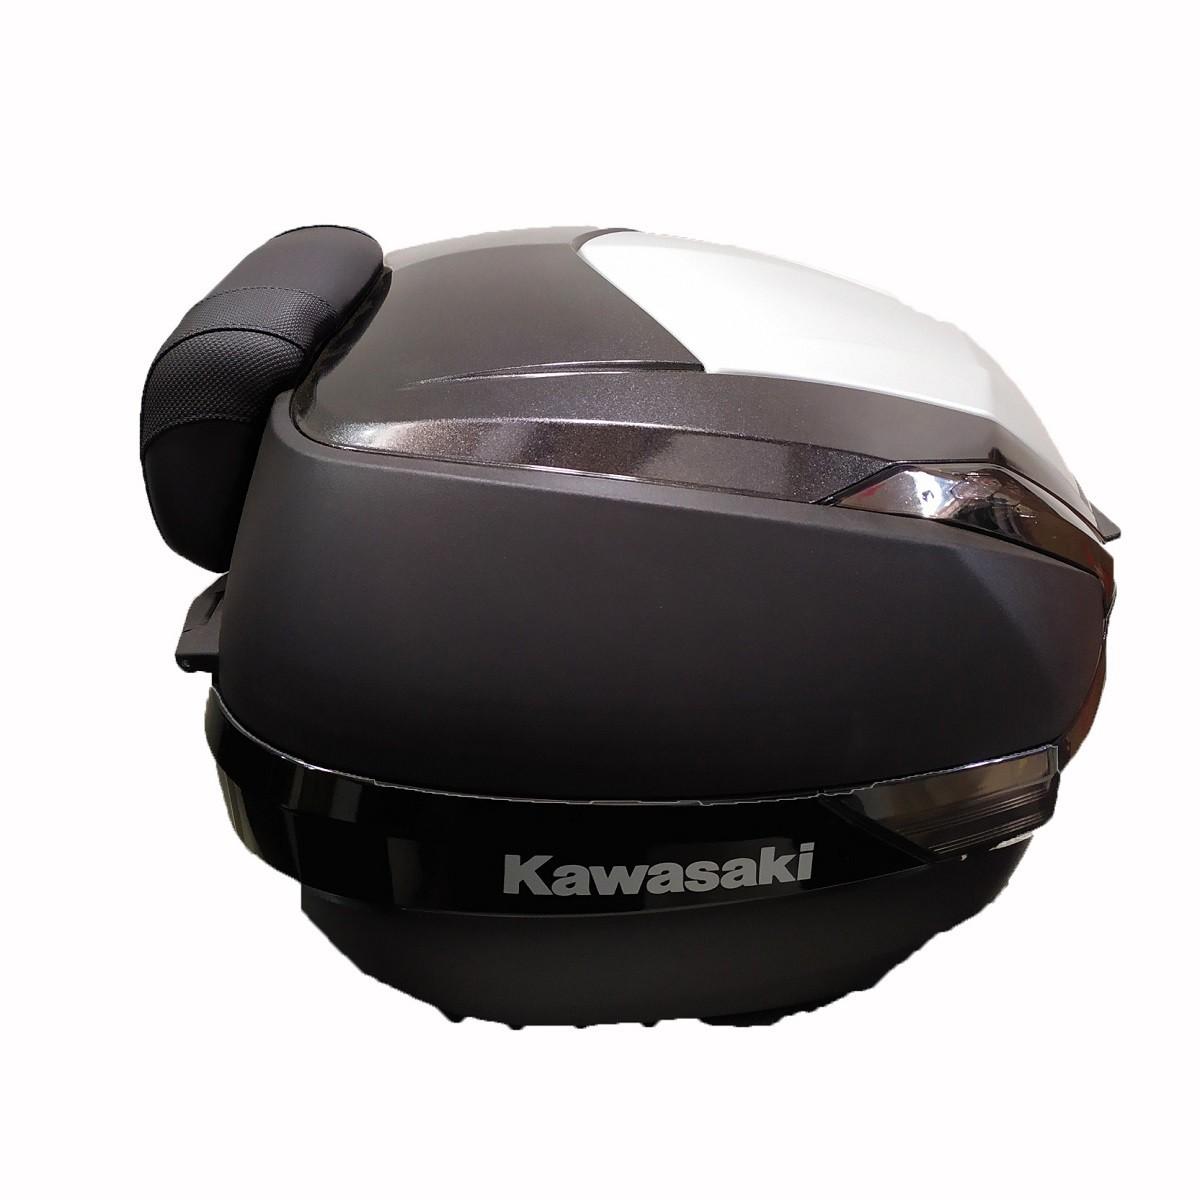 Bau Central Original Kawasaki c/ Encosto Original - Monokey (Acompanha Base)